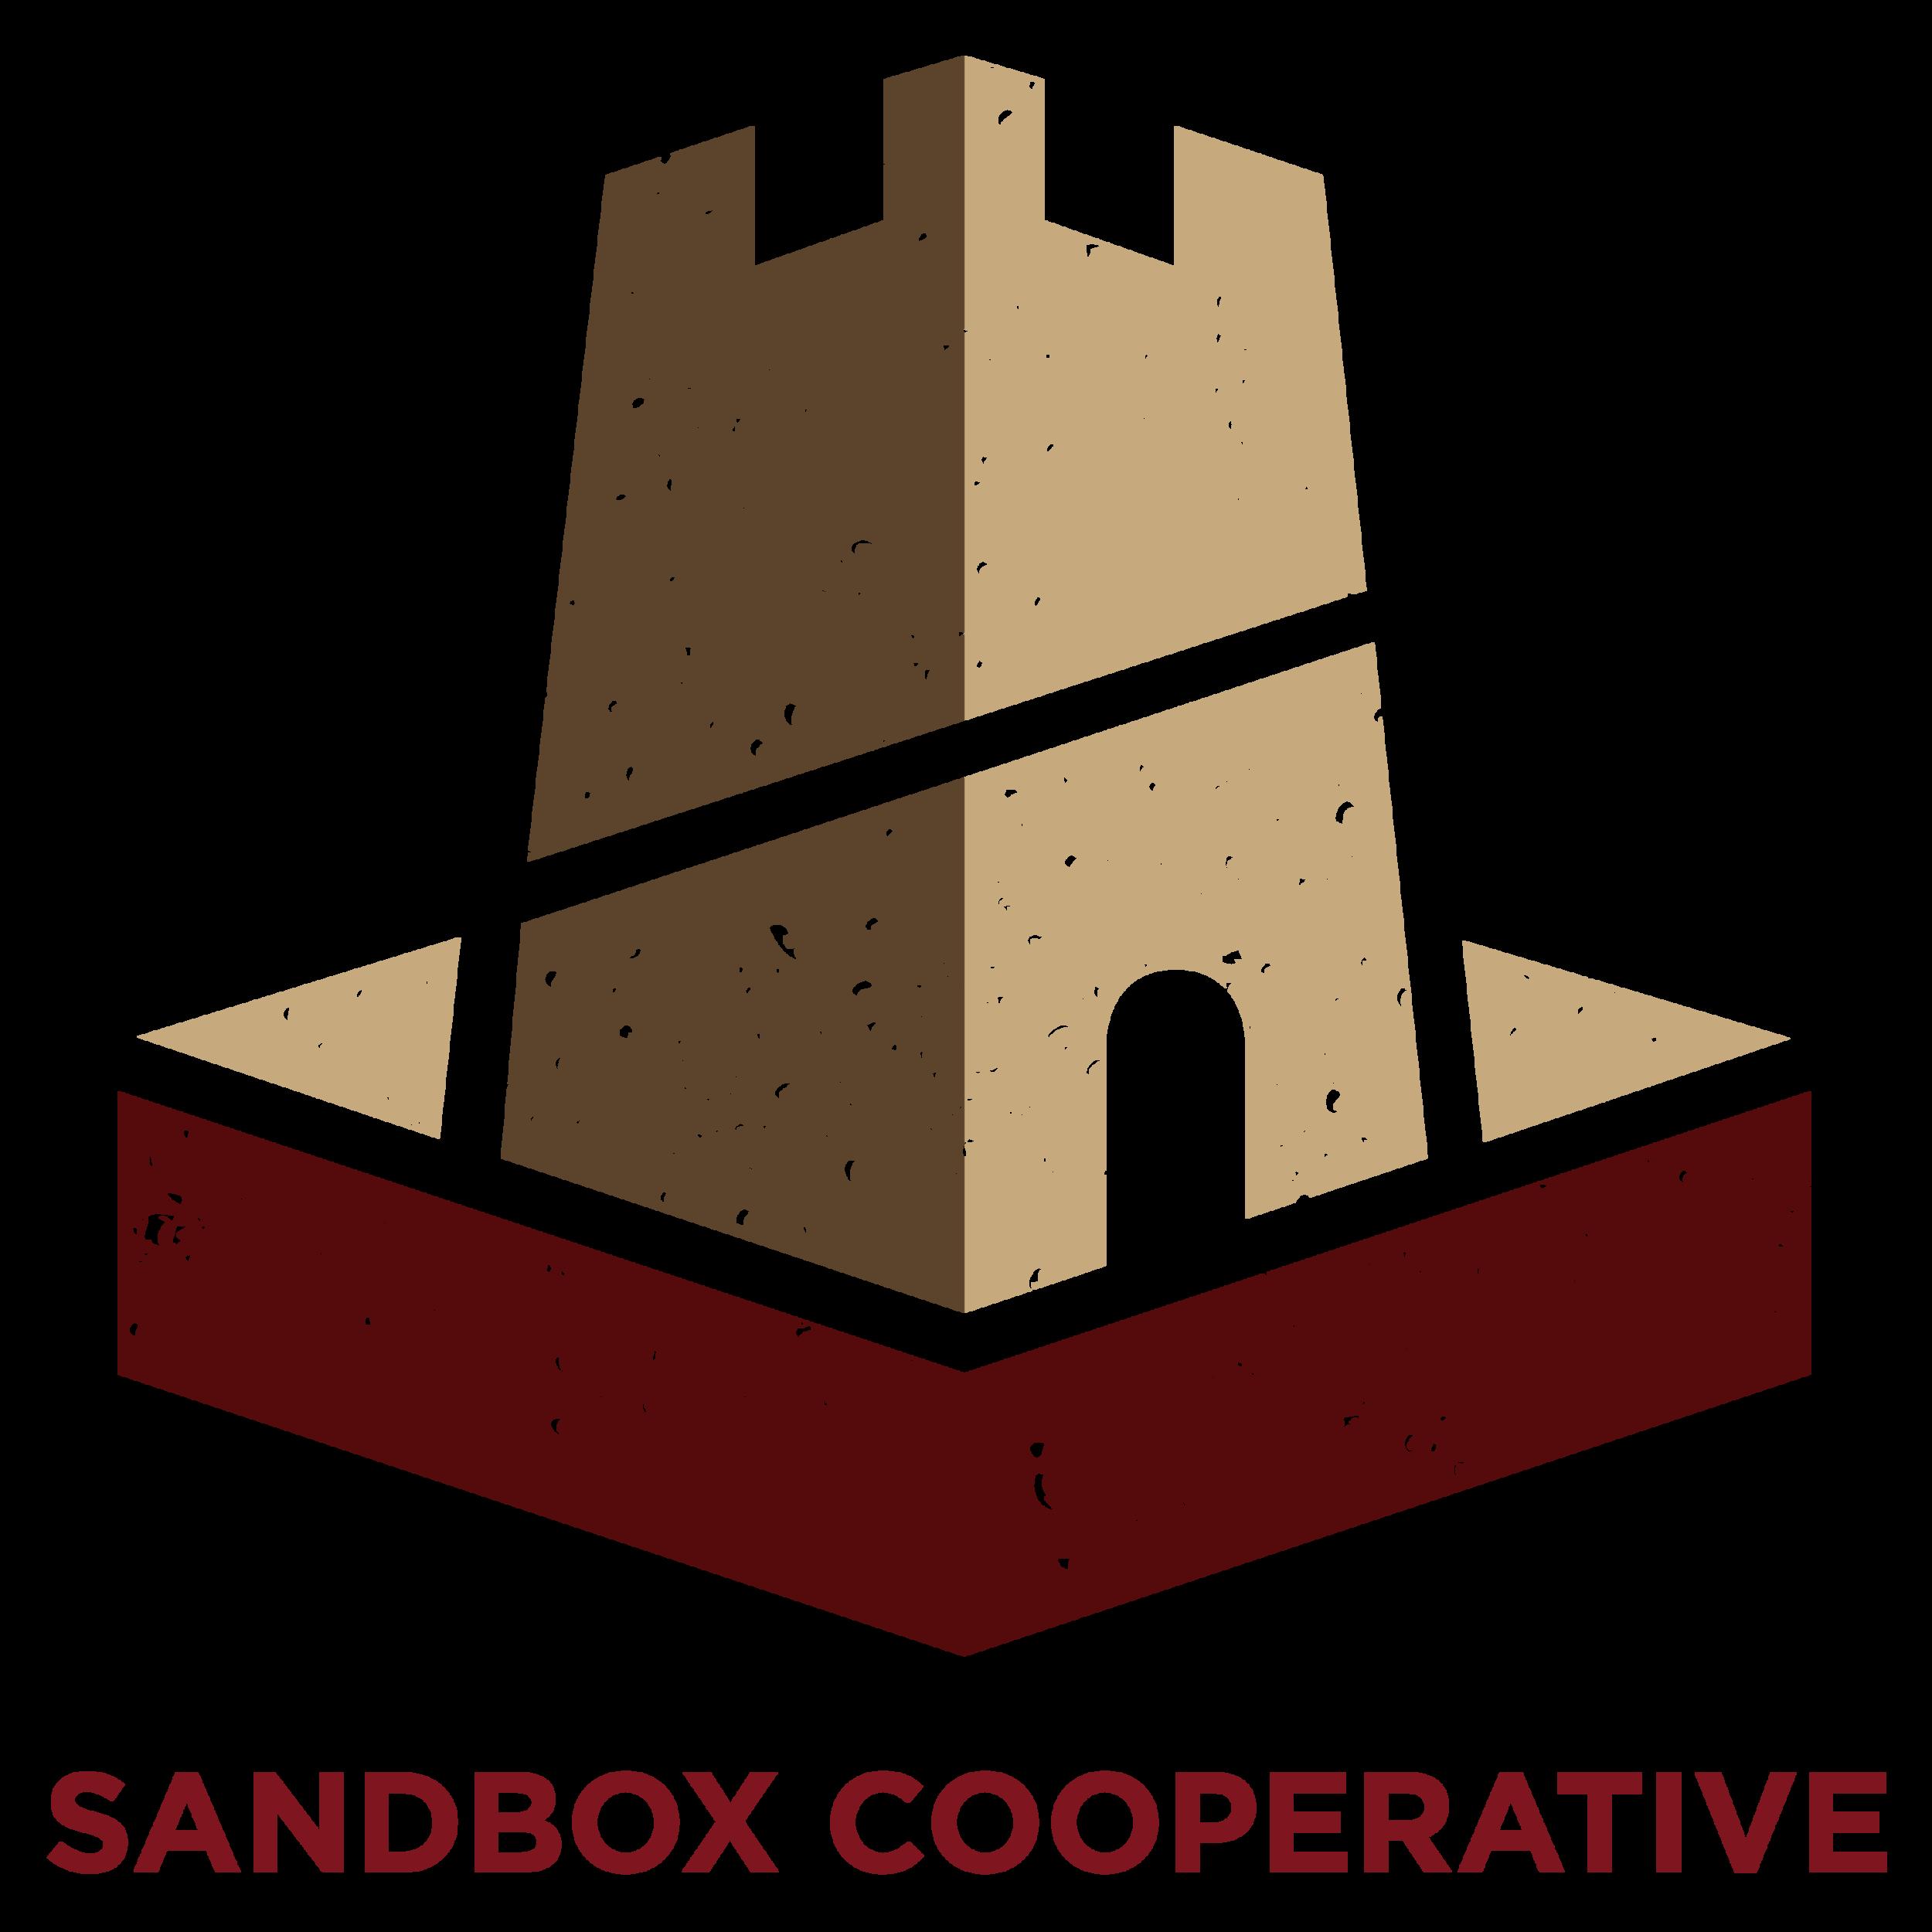 sandboxcoop-5b101430d5430.png